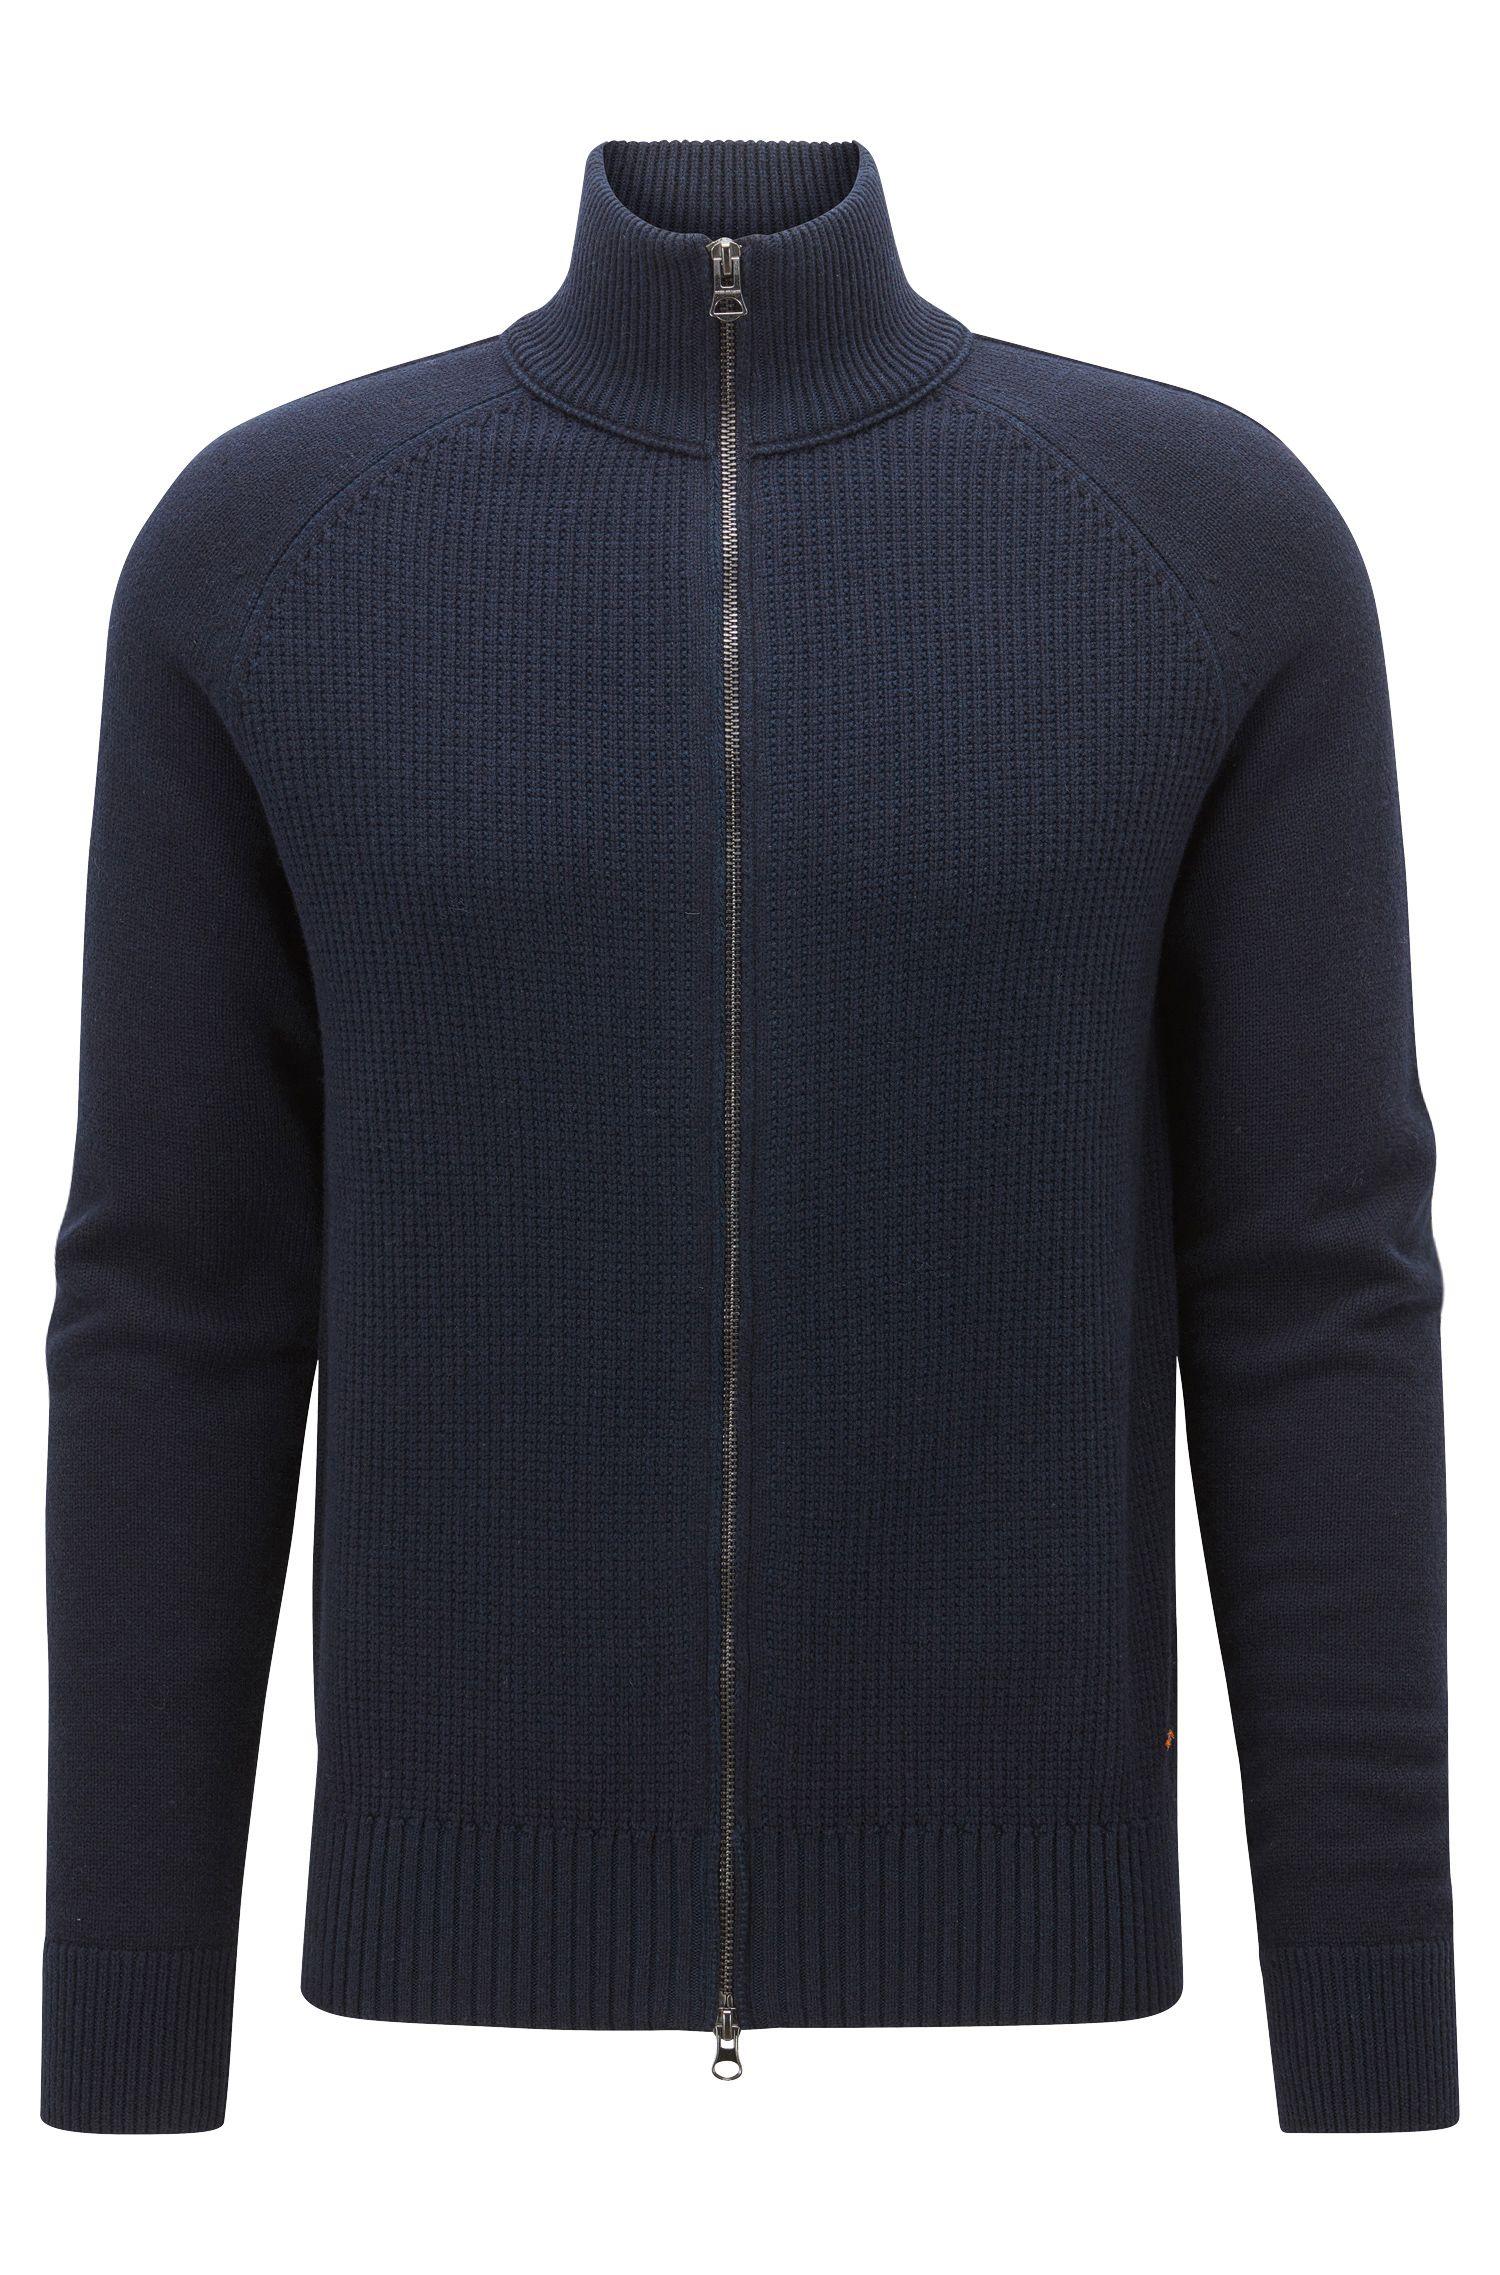 Regular-fit cotton-blend jacket with zip